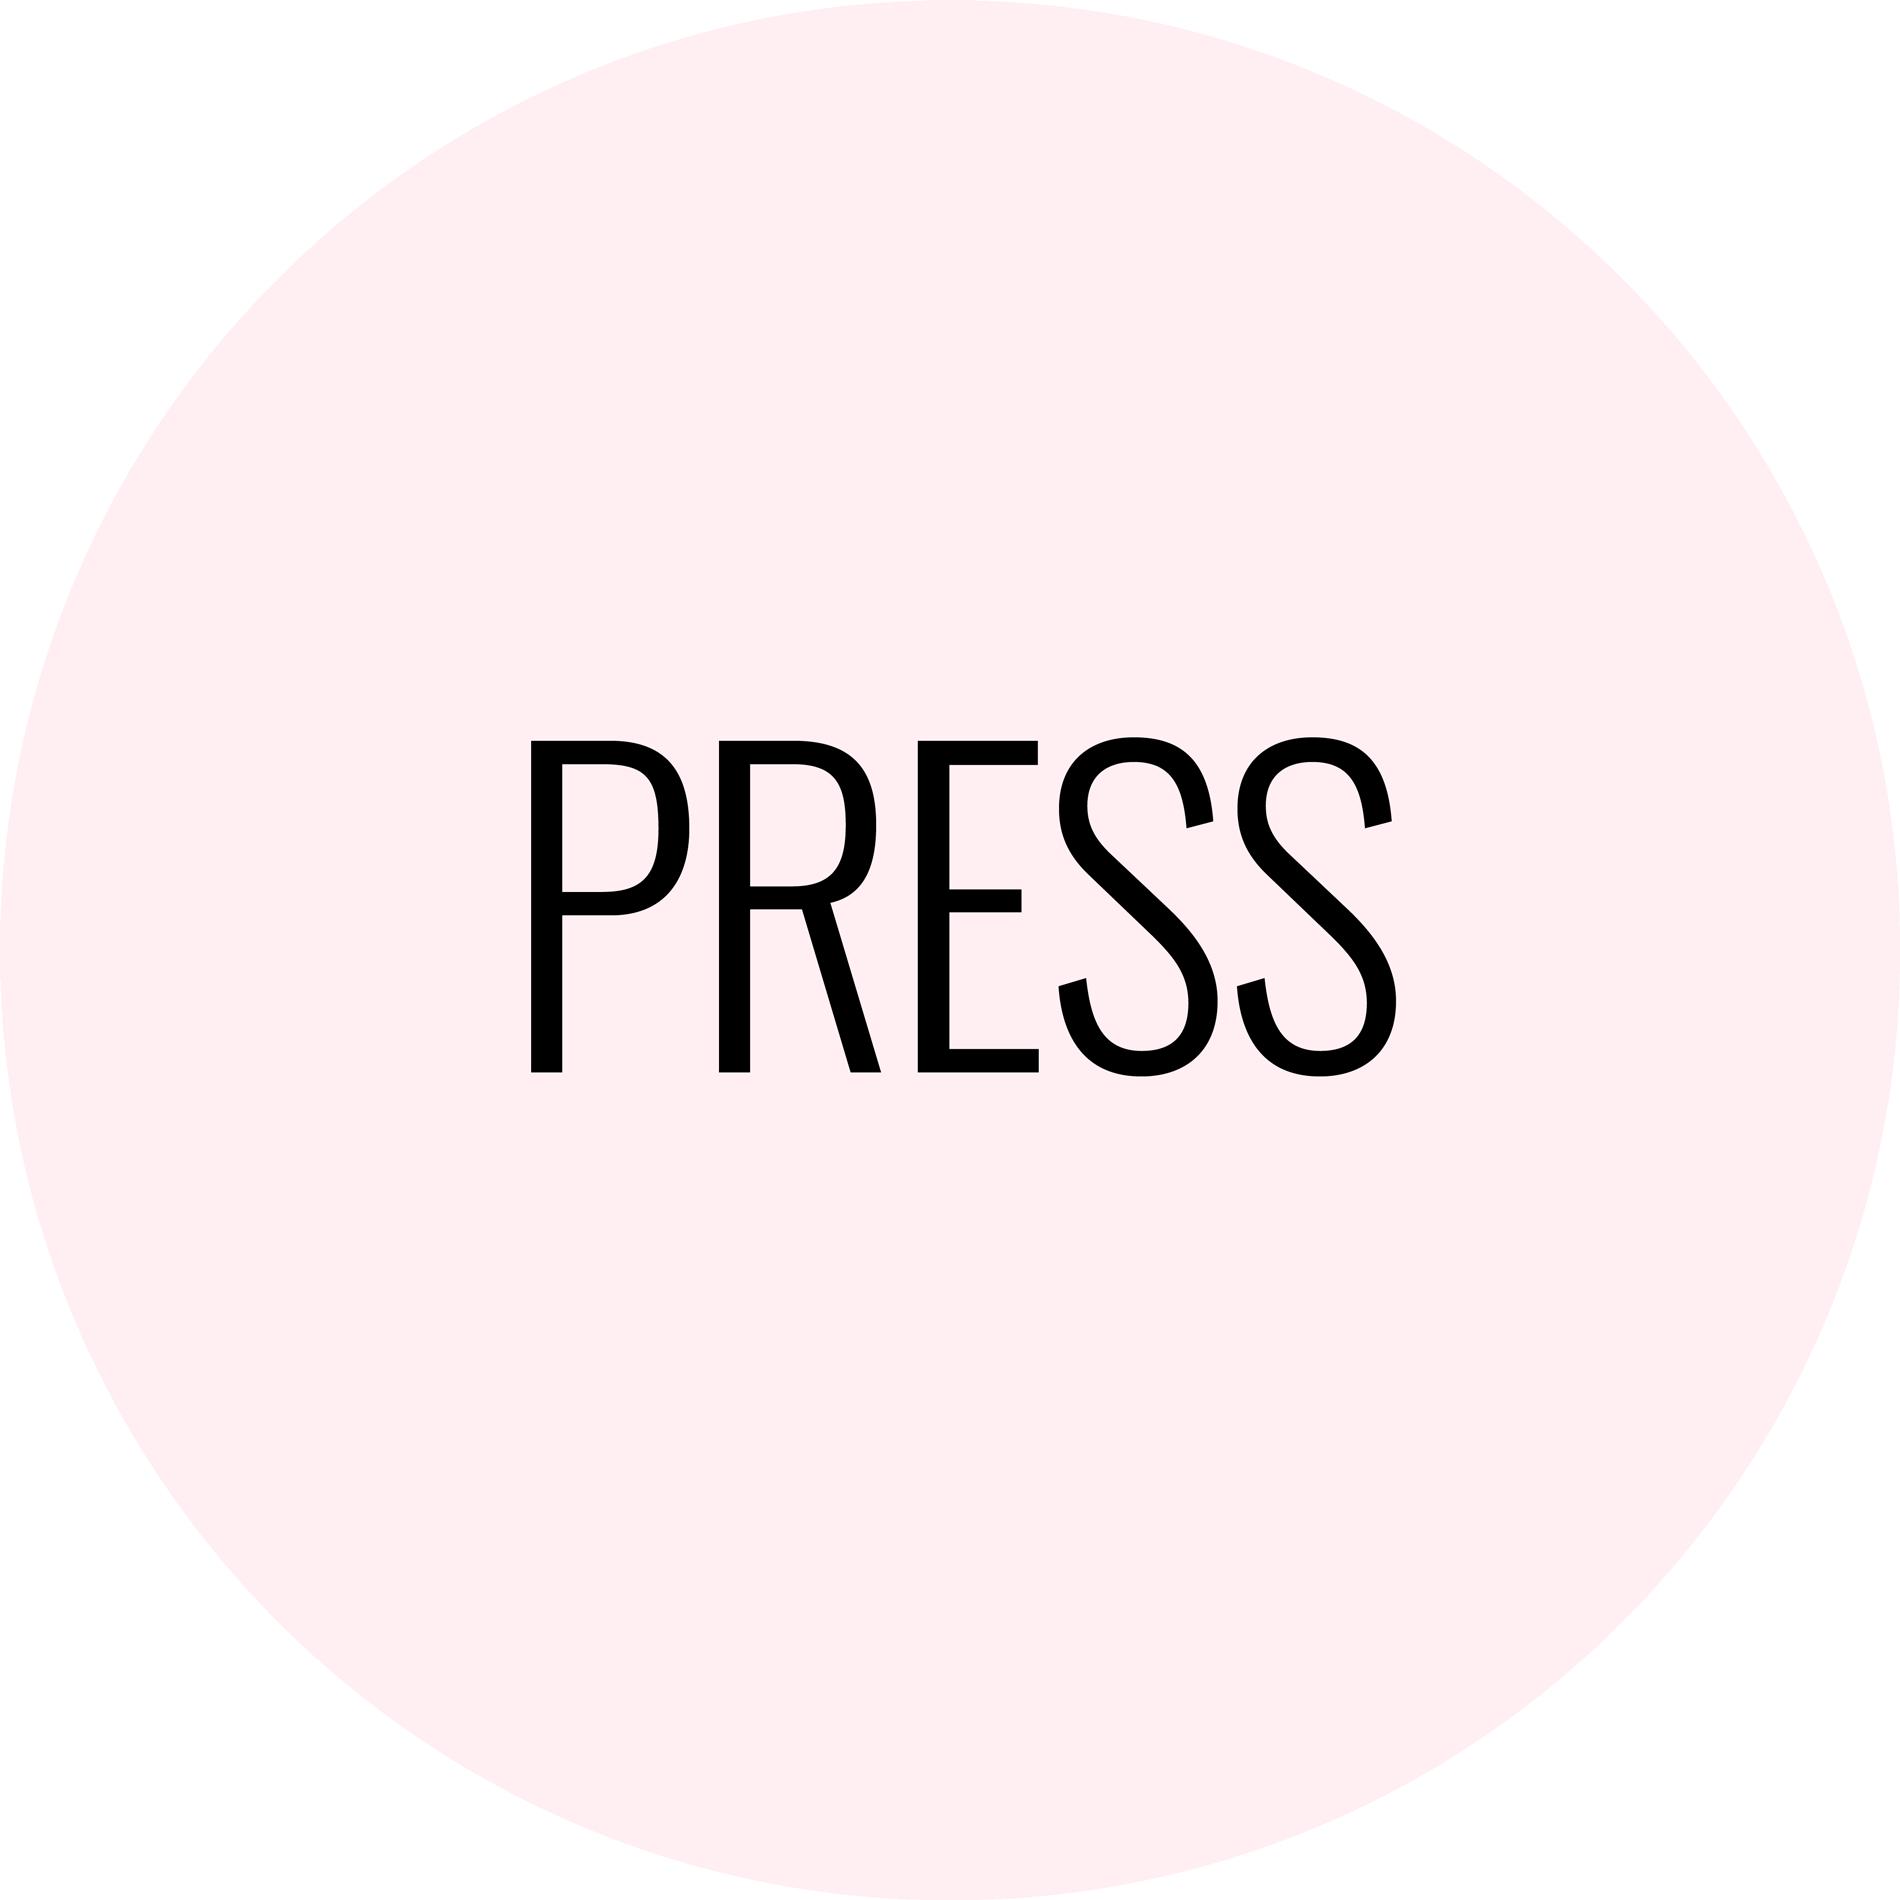 alicia-oliveri-professional-make-up-artist-new-york-city-press-button.png